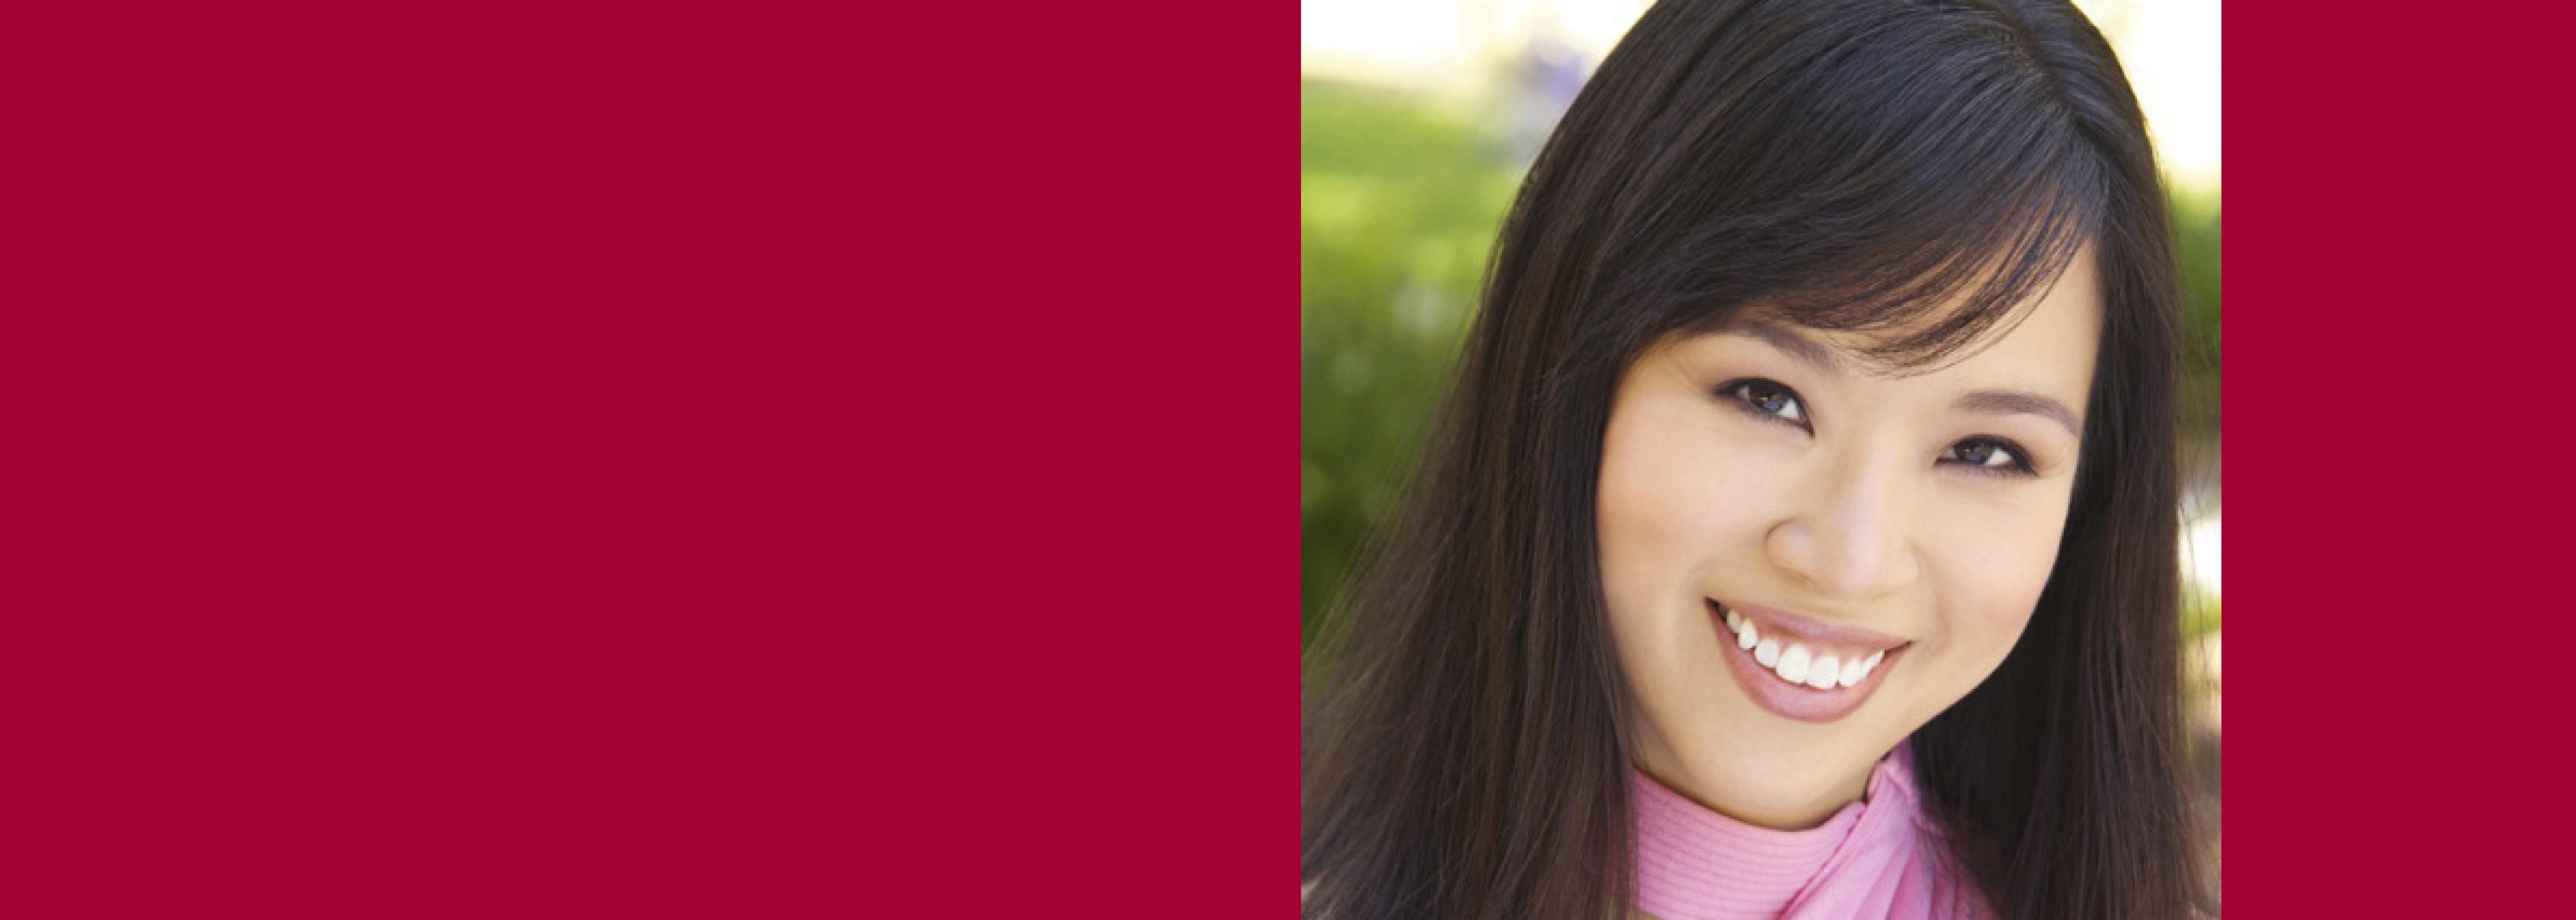 Chapman College Events Calendar February 2020 A Thousand Hands: A Million Stars—Clara Cheng Stosch, piano